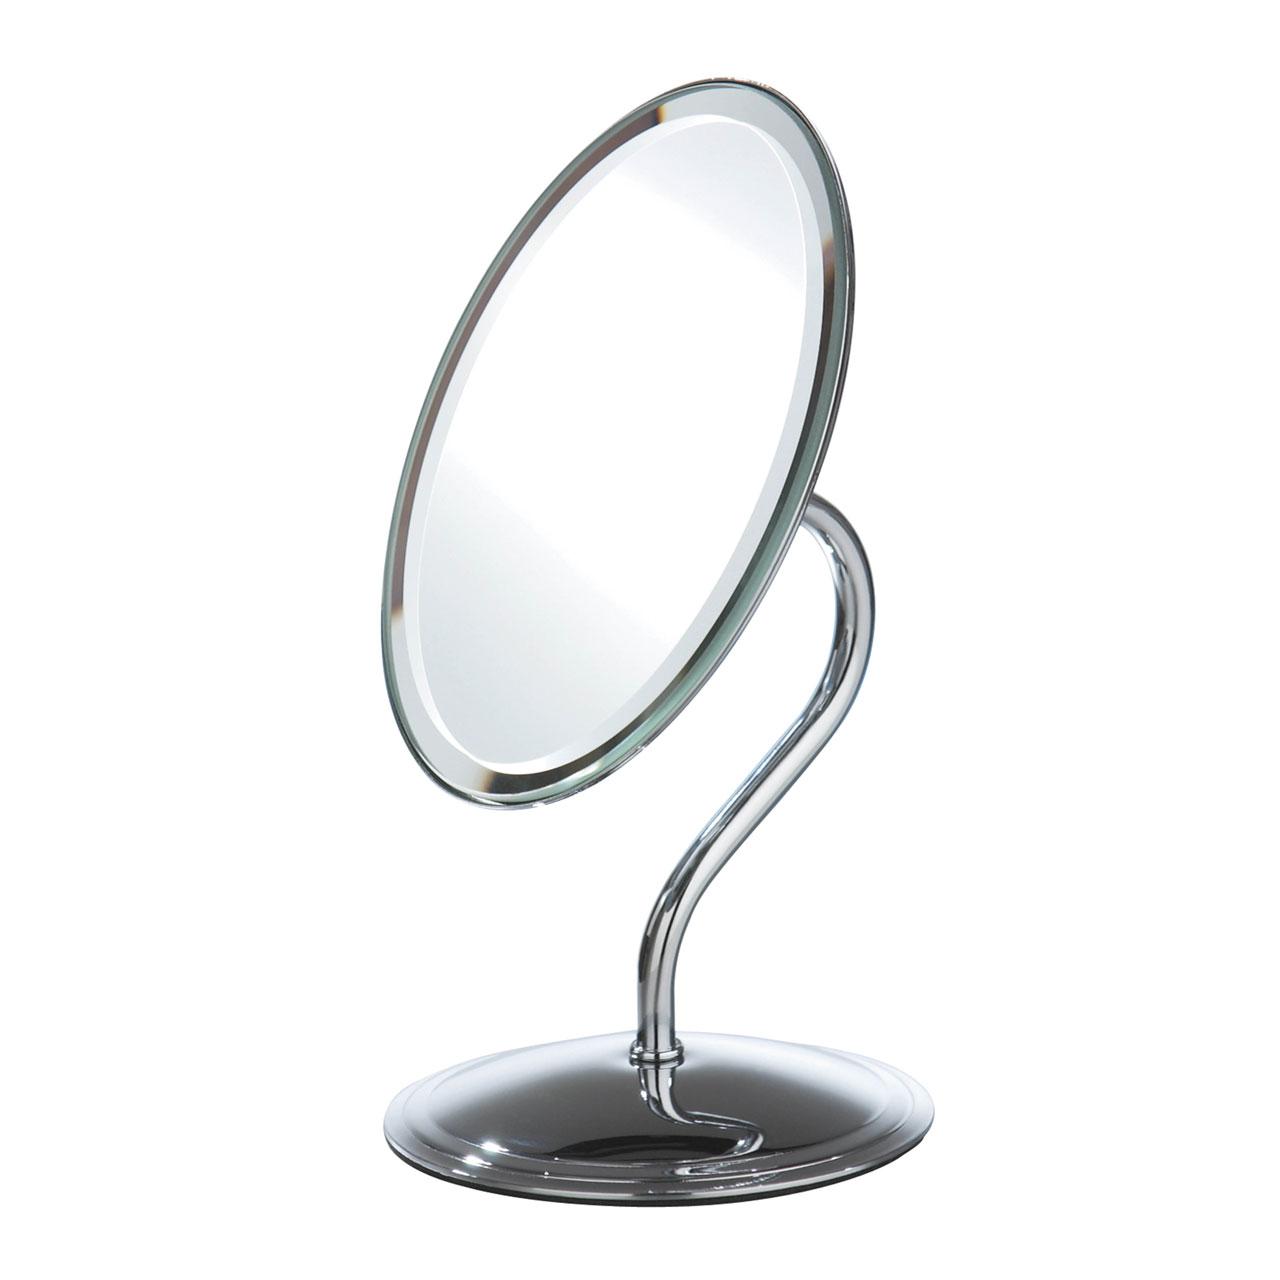 Chrome Effect Free Standing Modern Bathroom Shaving Oval Mirror Adelbrook Discount Store